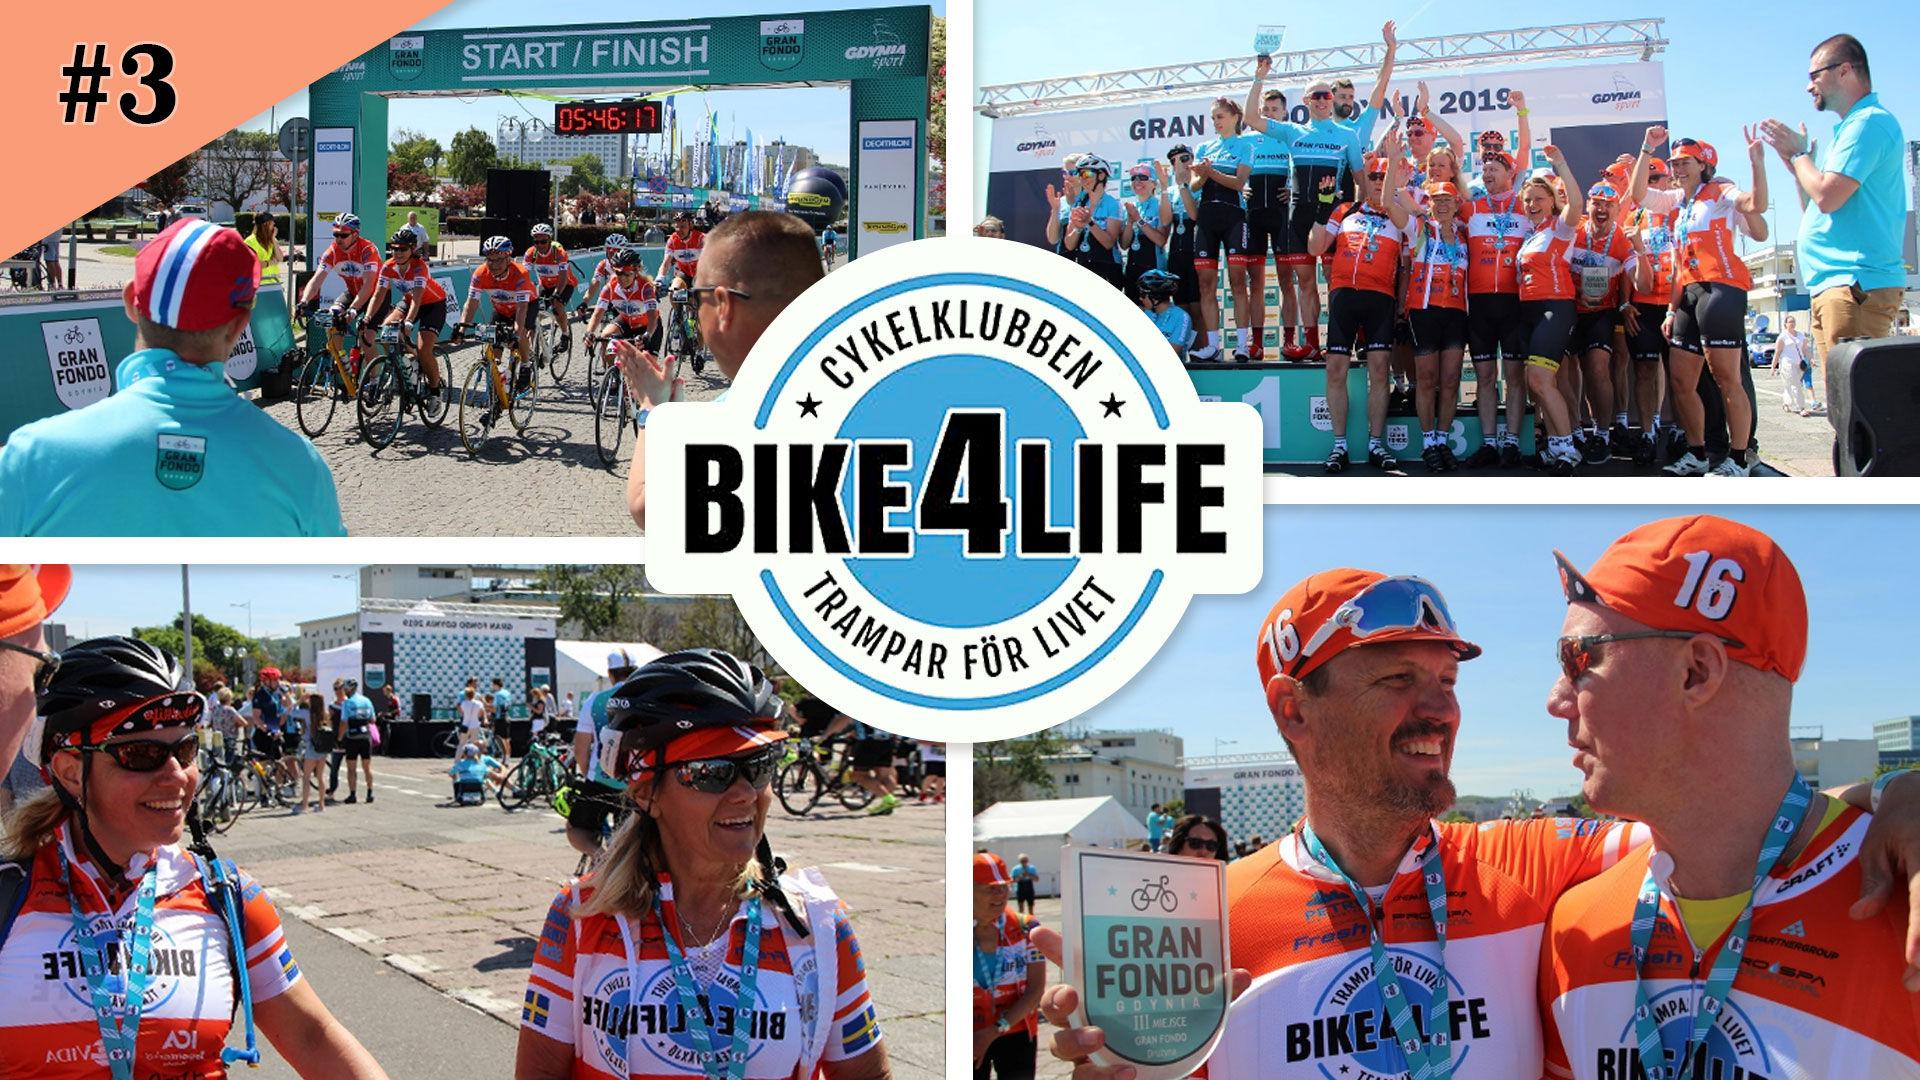 Bike4Life etapp 3